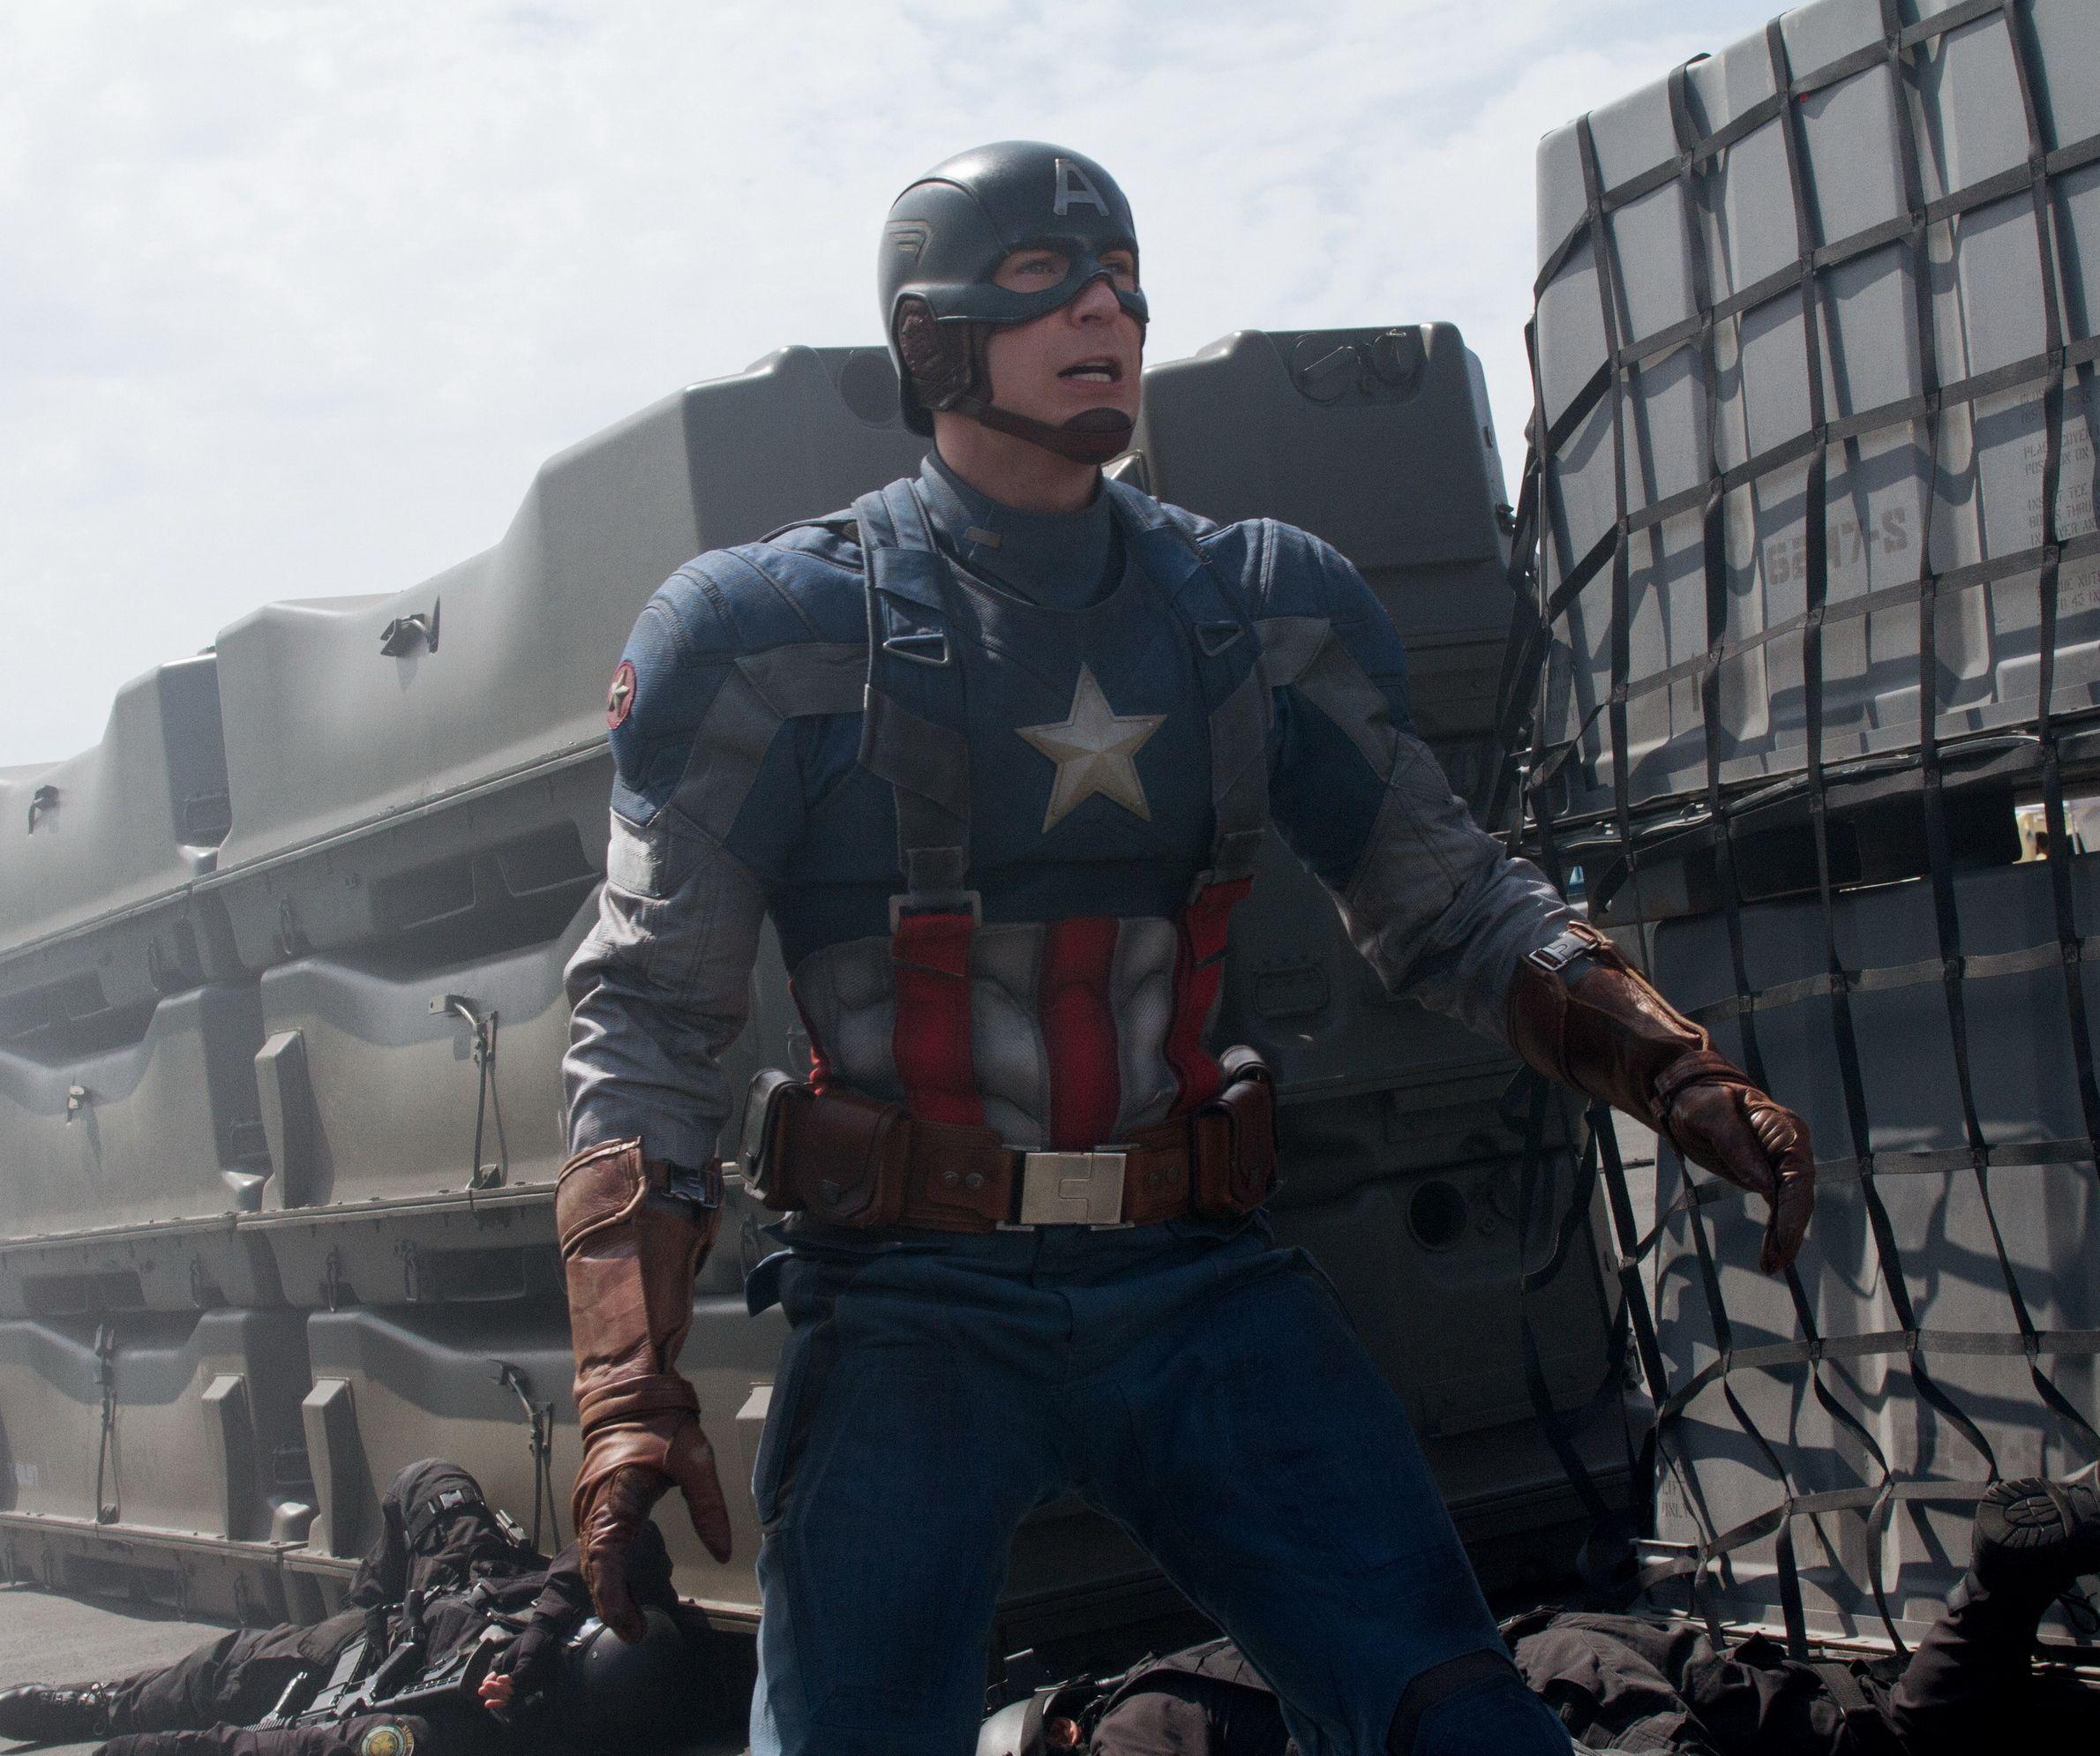 Chris Evans as Captain America: The Winter Soldier